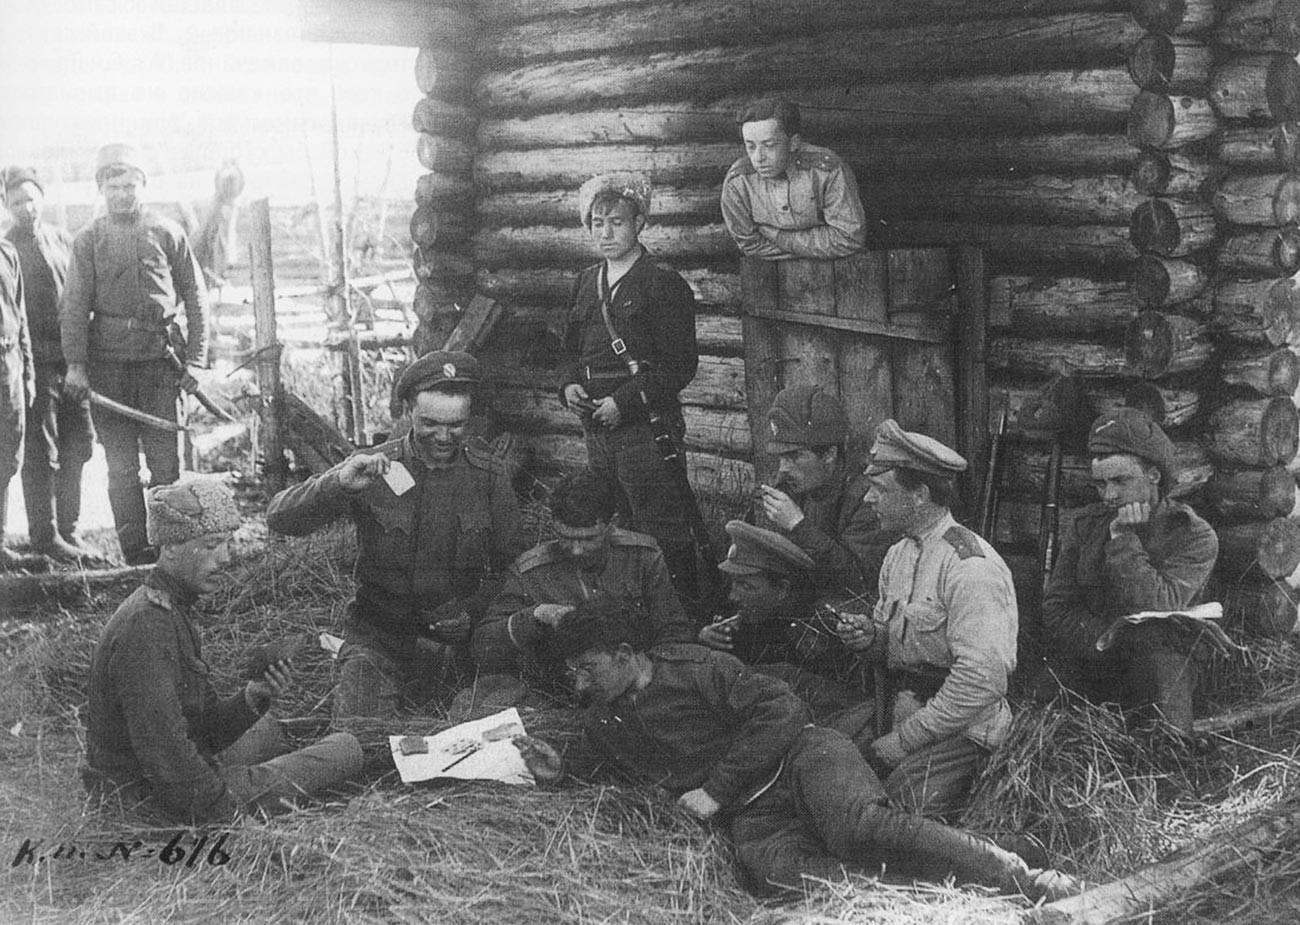 Troupes de Koltchak